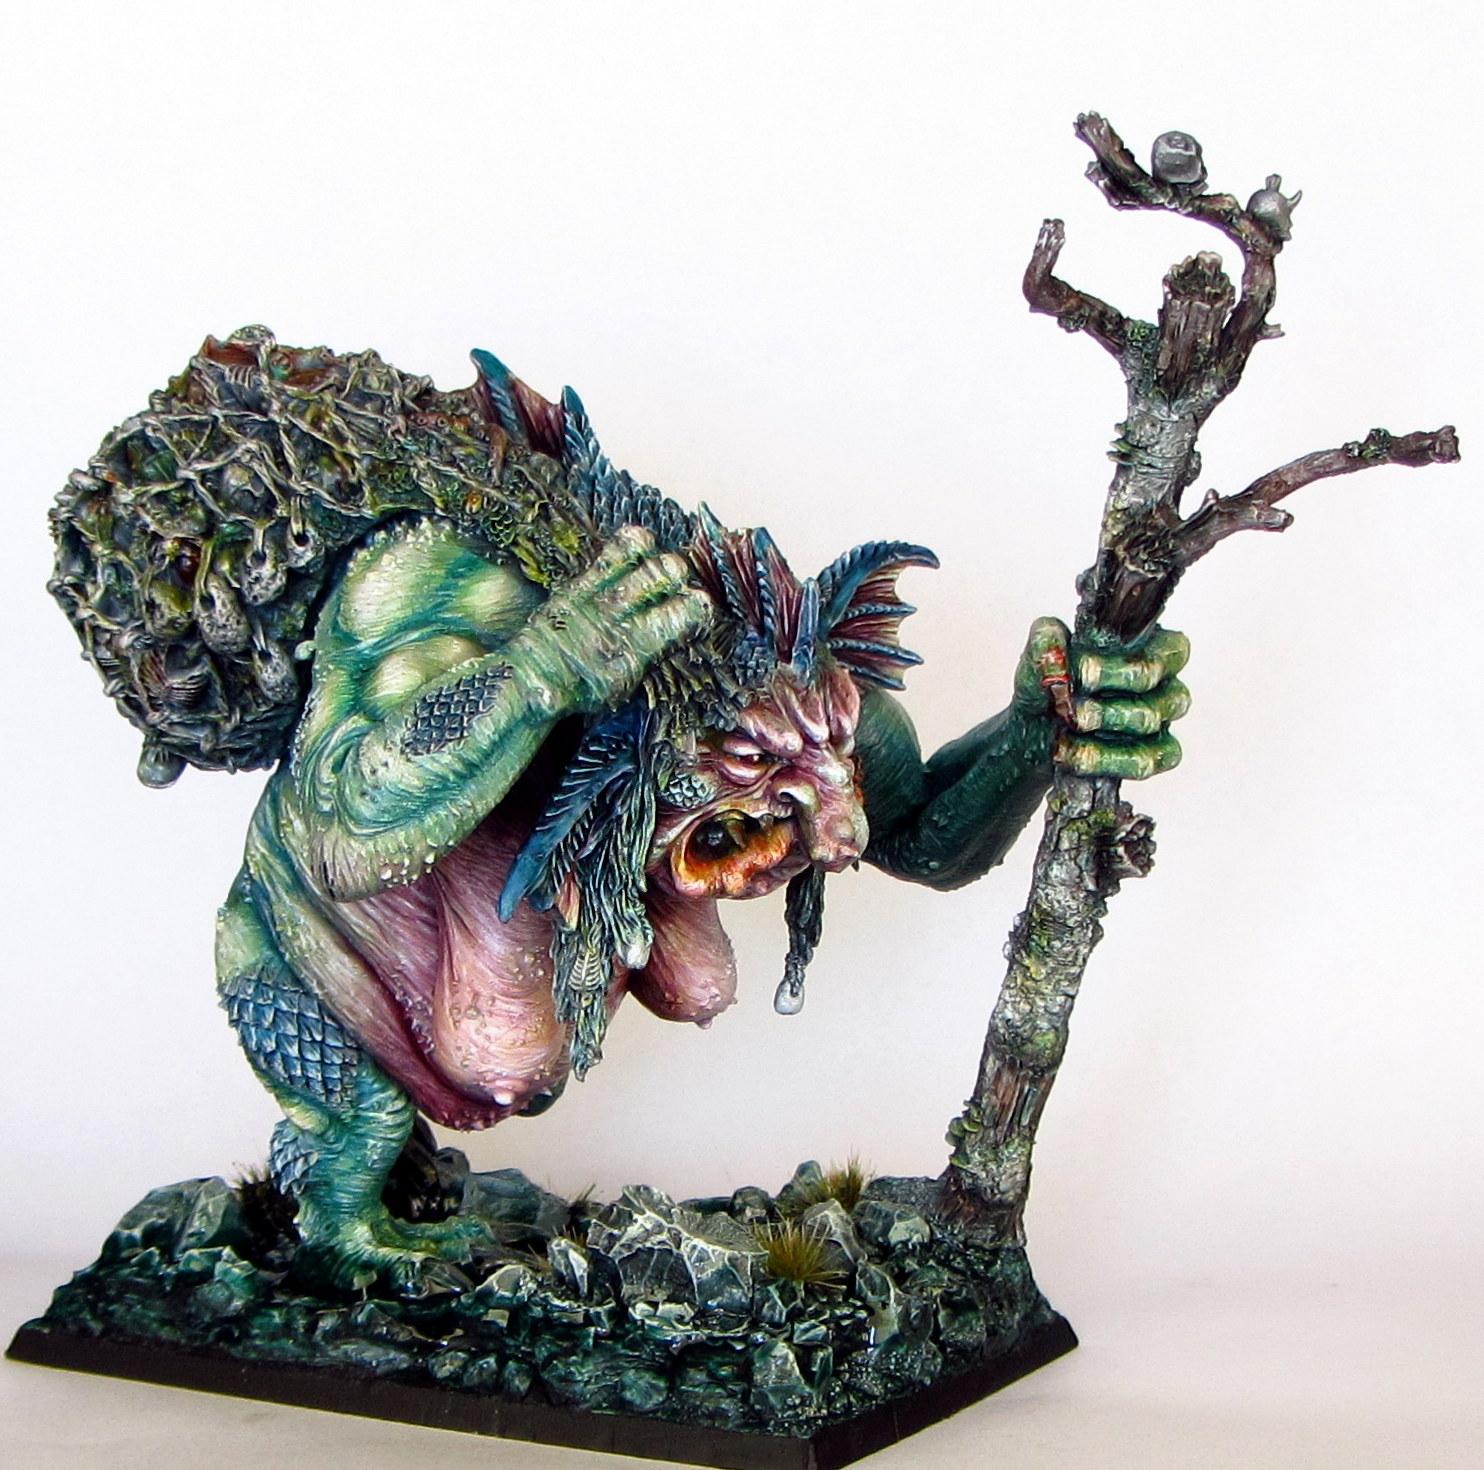 Orc troll abuse nude scene